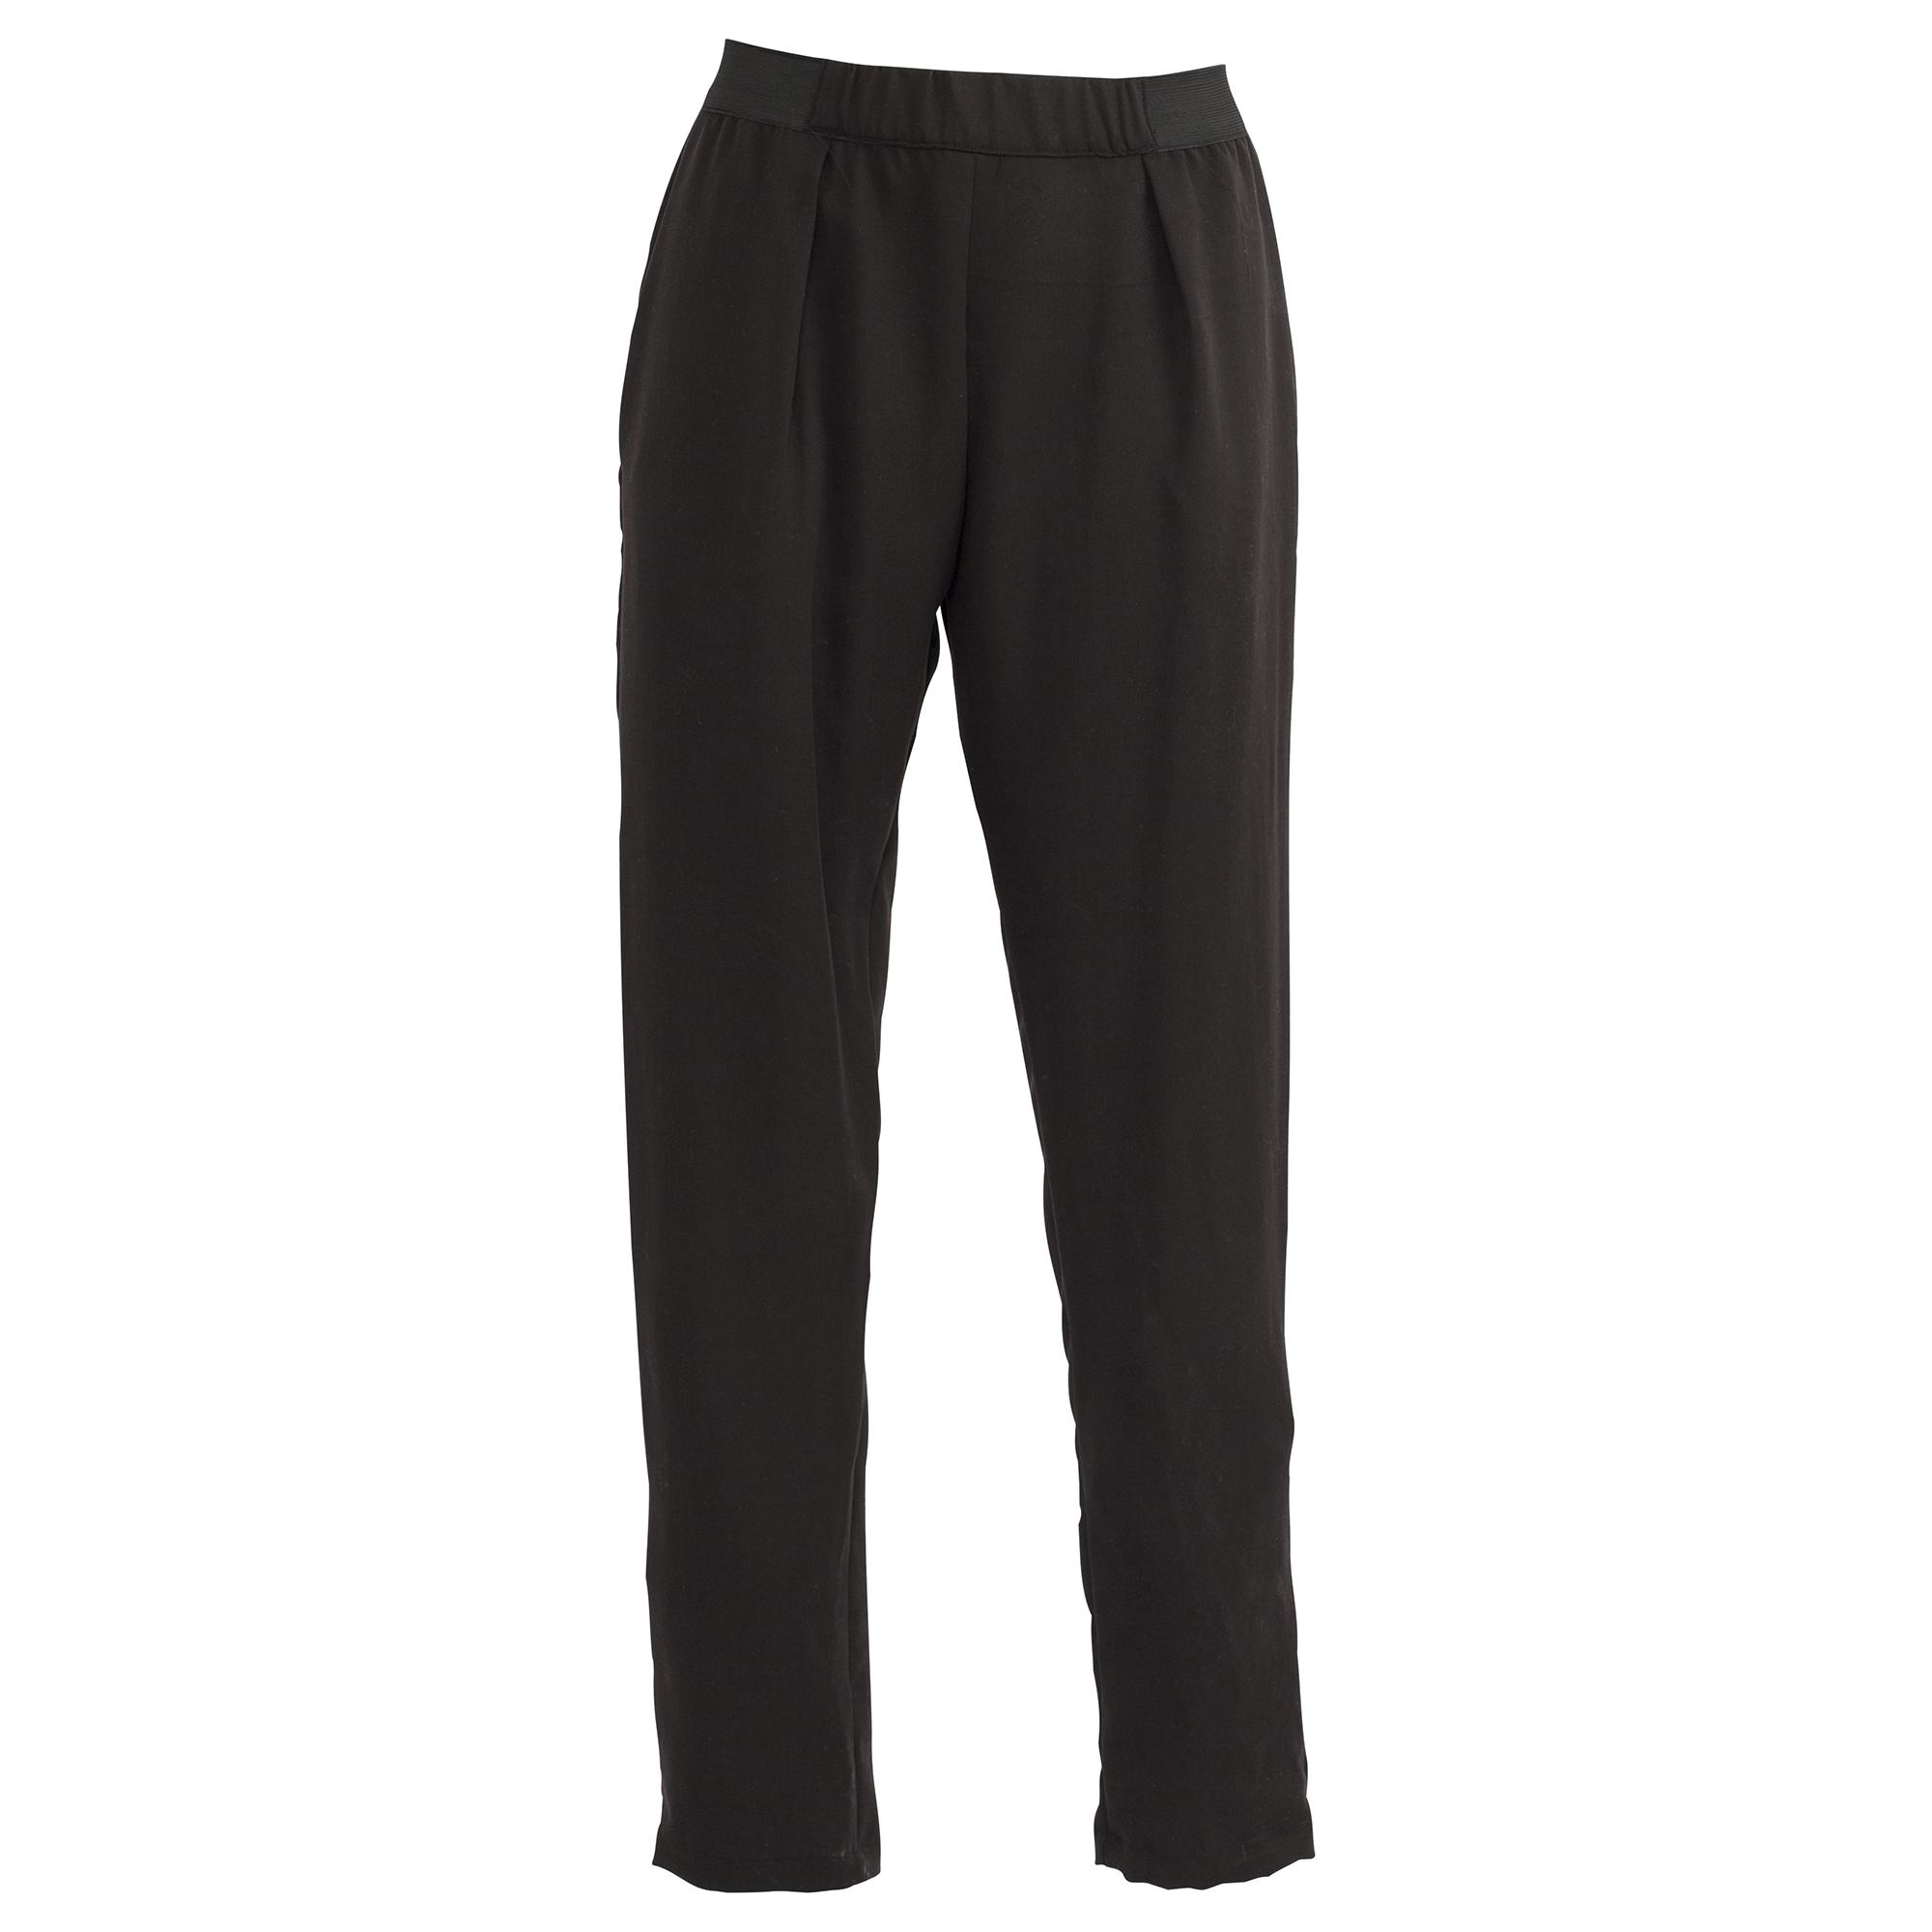 LOVJOI VISKLA Pants black Nachhaltig & Fair